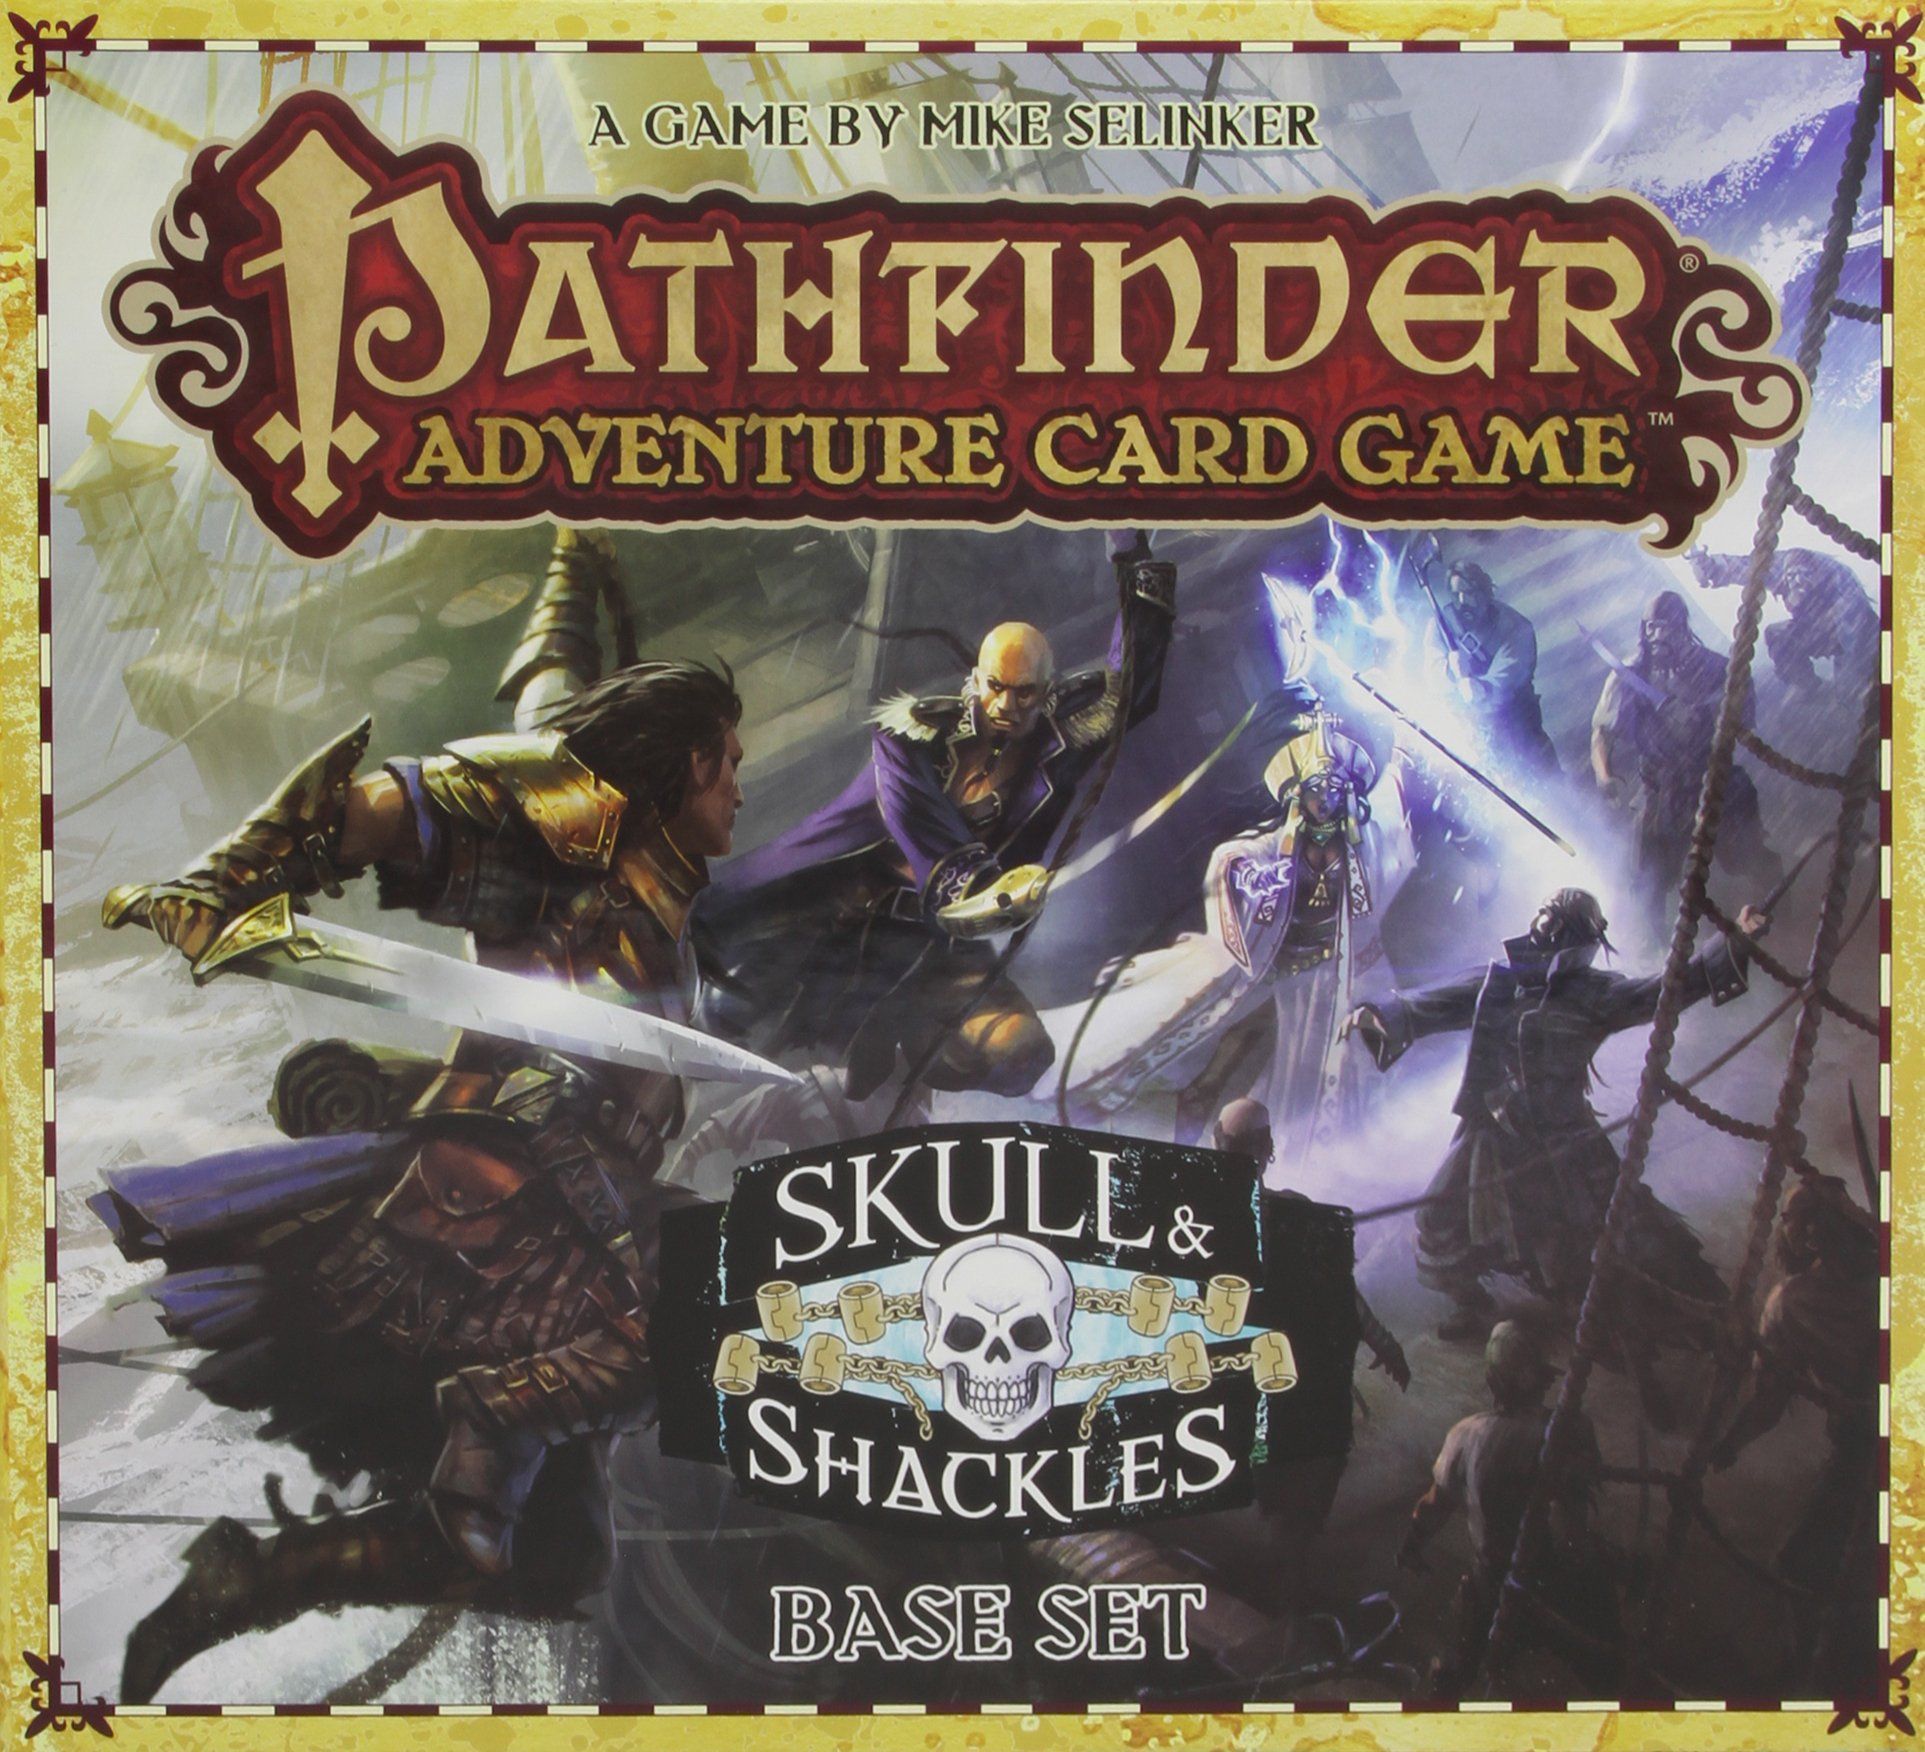 Pathfinder Adventure Card Game: Skull & Shackles Base Set Price:$44.25